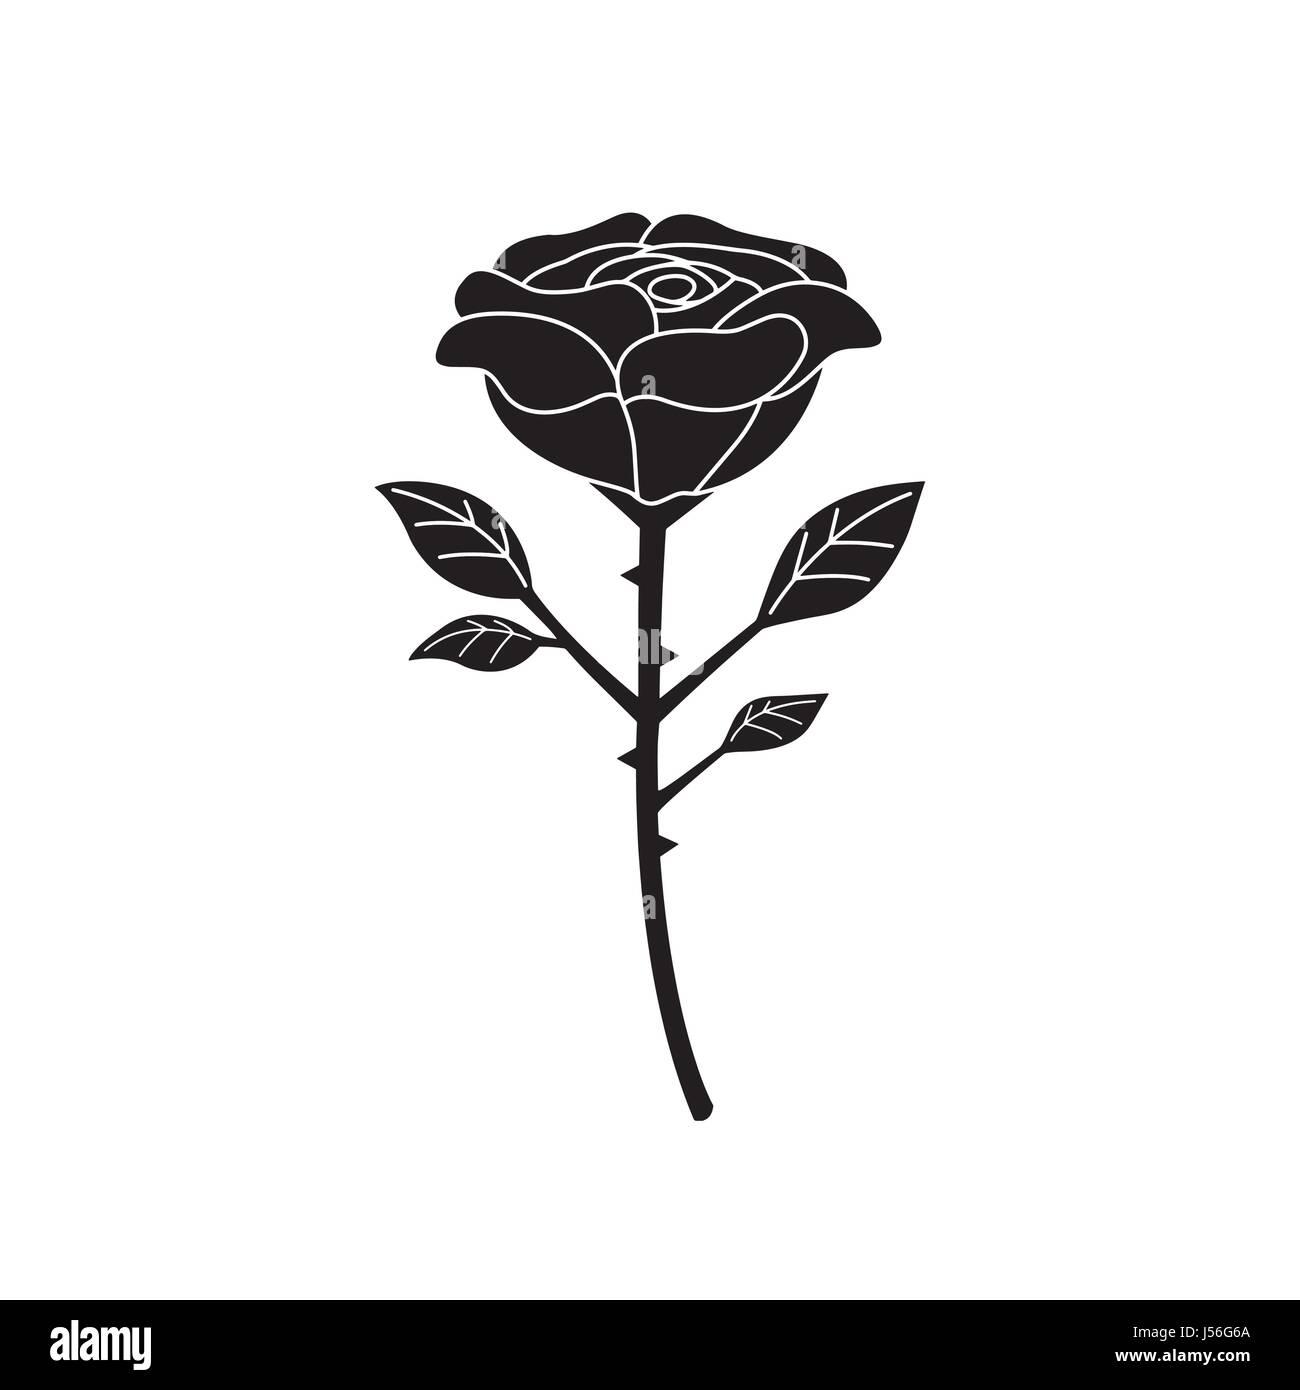 Rose Tattoo Design Stock Vector Image Art Alamy,Database Design For Mere Mortals